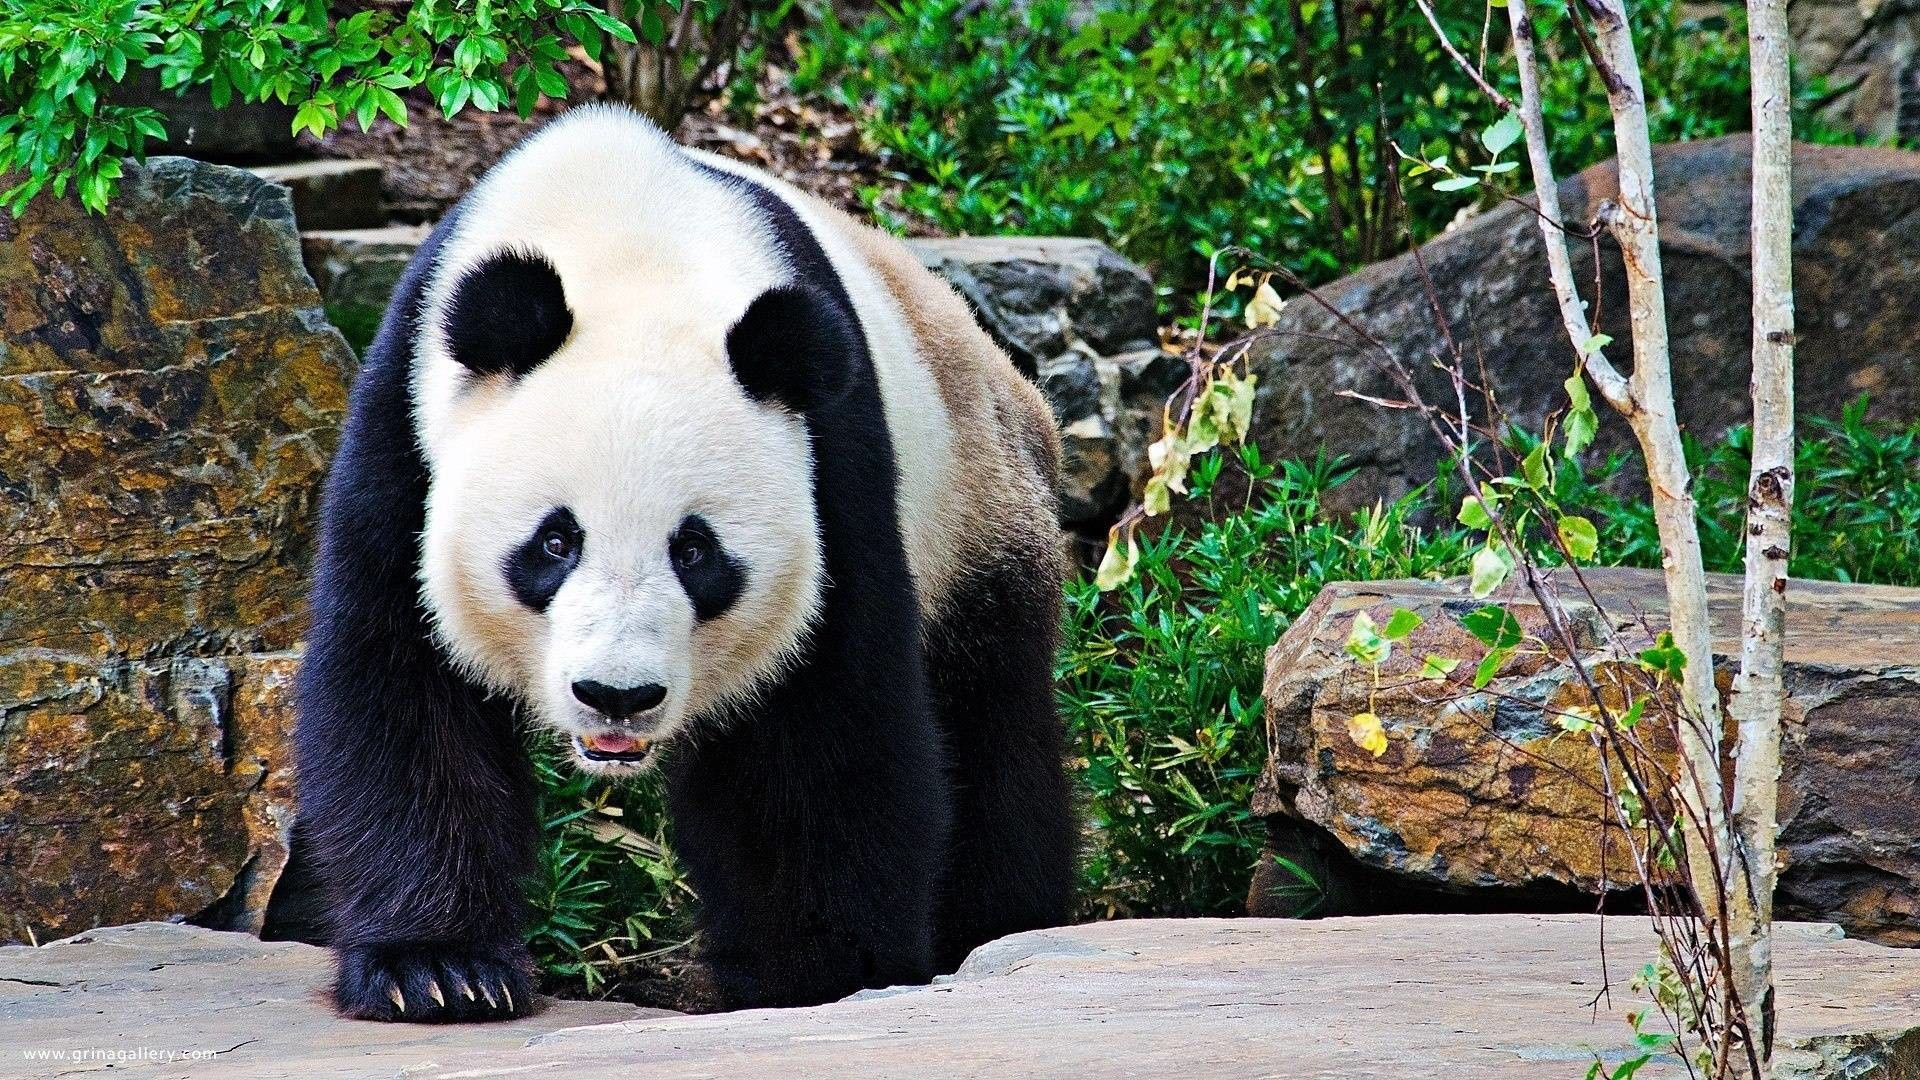 Panda bear wallpaper Wide or HD   Animals Wallpapers